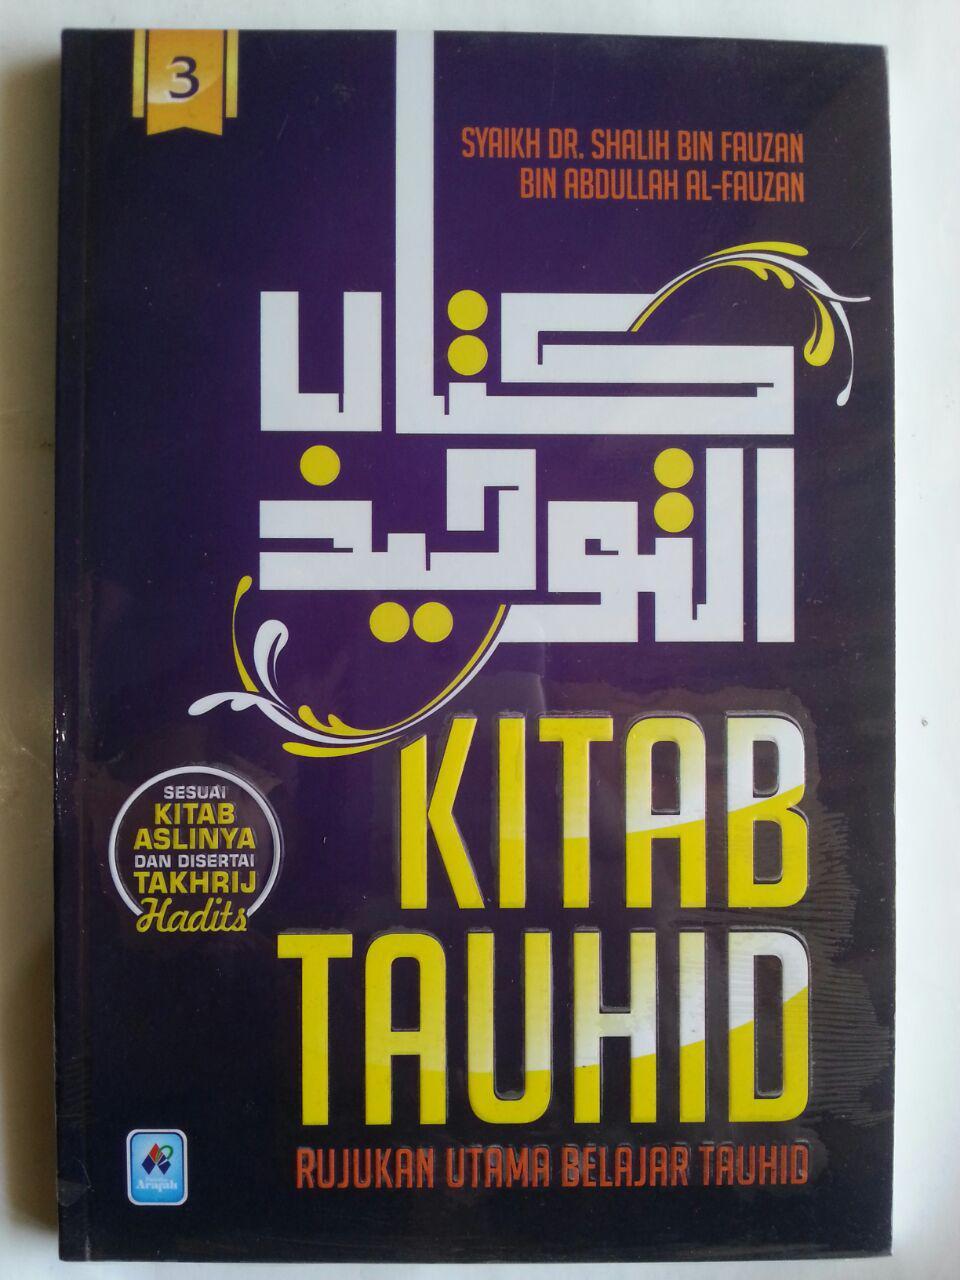 Buku Kitab Tauhid Rujukan Utama Belajar Tauhid 1 Set 3 Jilid isi